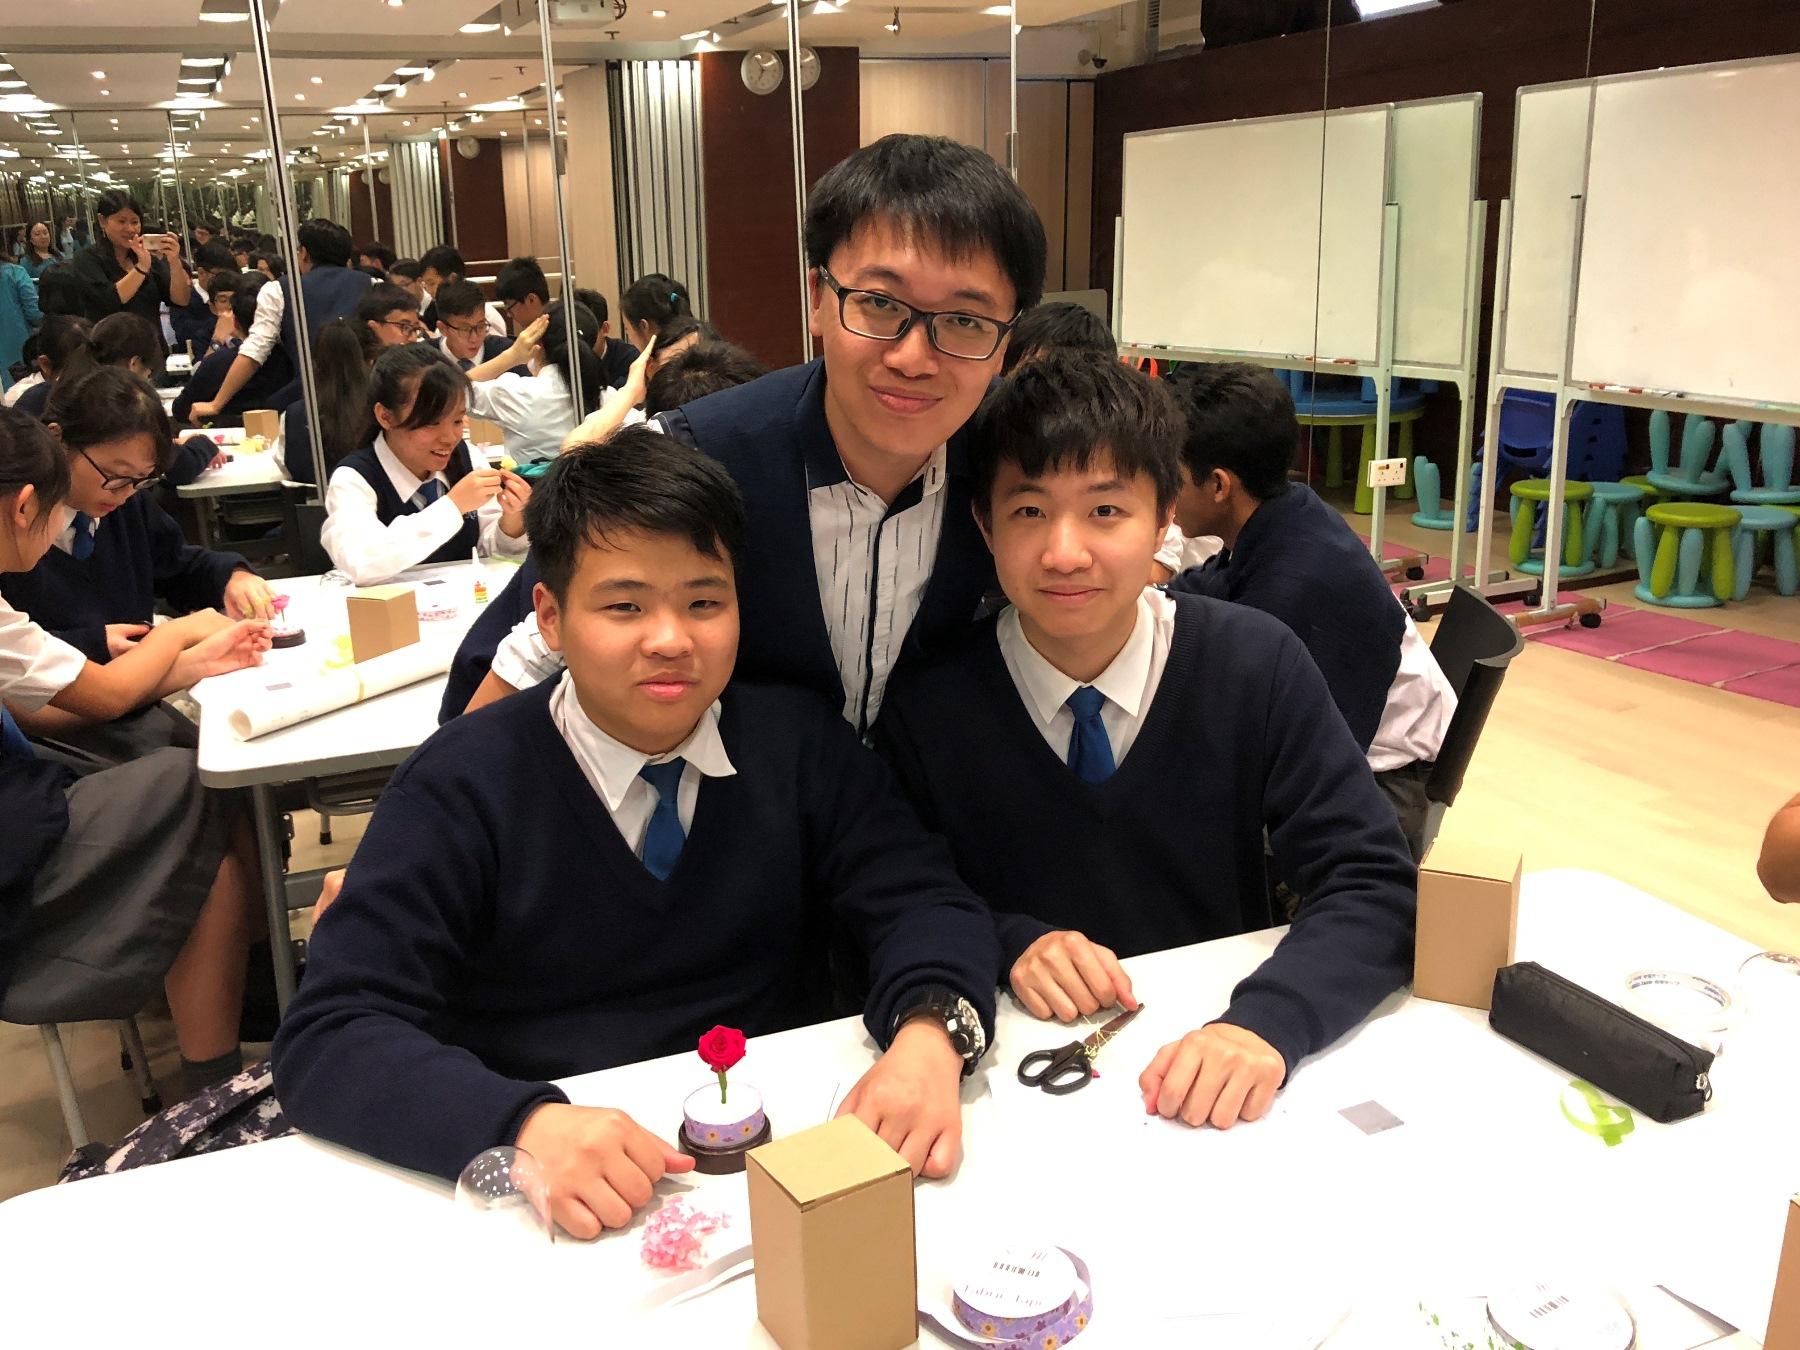 http://npc.edu.hk/sites/default/files/img_1523.jpg